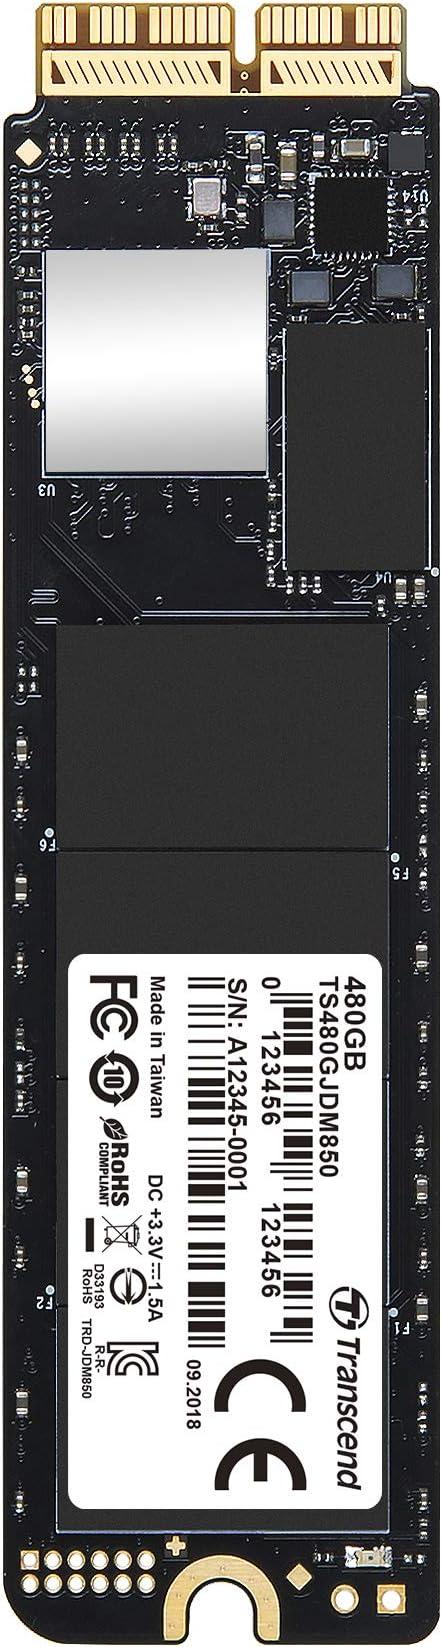 Transcend 480 Gb Jetdrive Jdm 850 Nvme Pcie Gen3 X4 Ssd Computer Zubehör